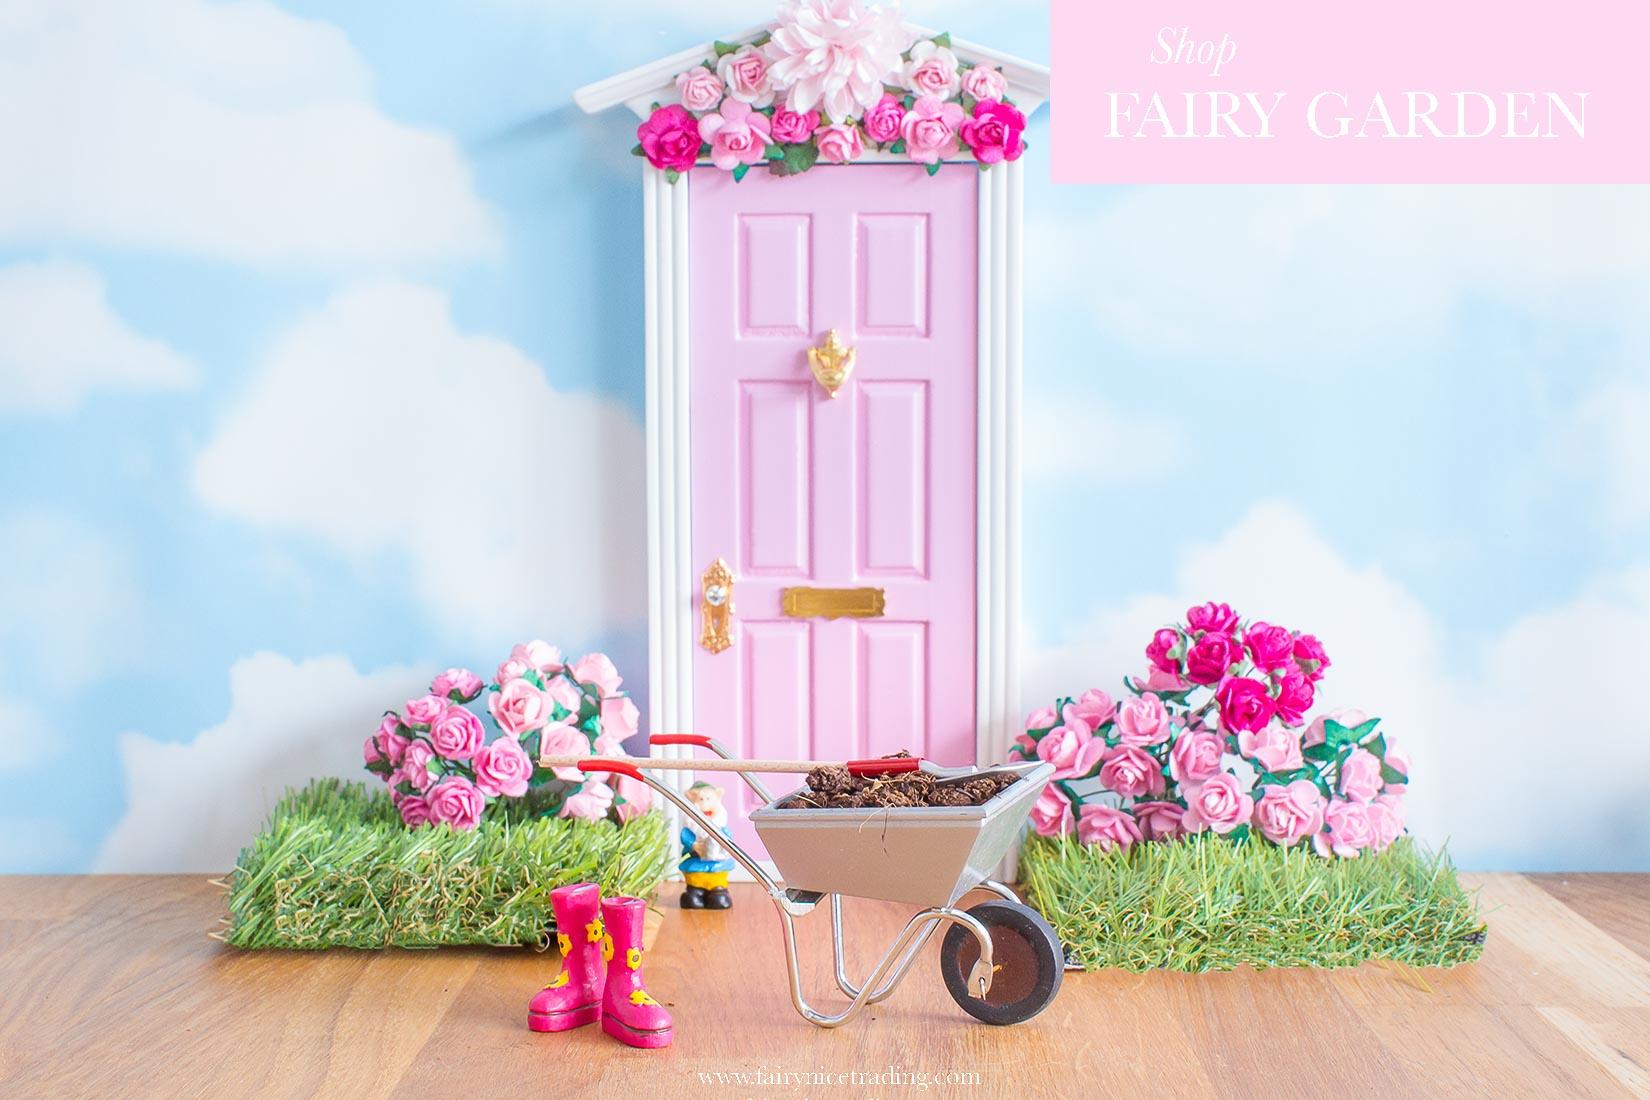 fairy garden accessories uk